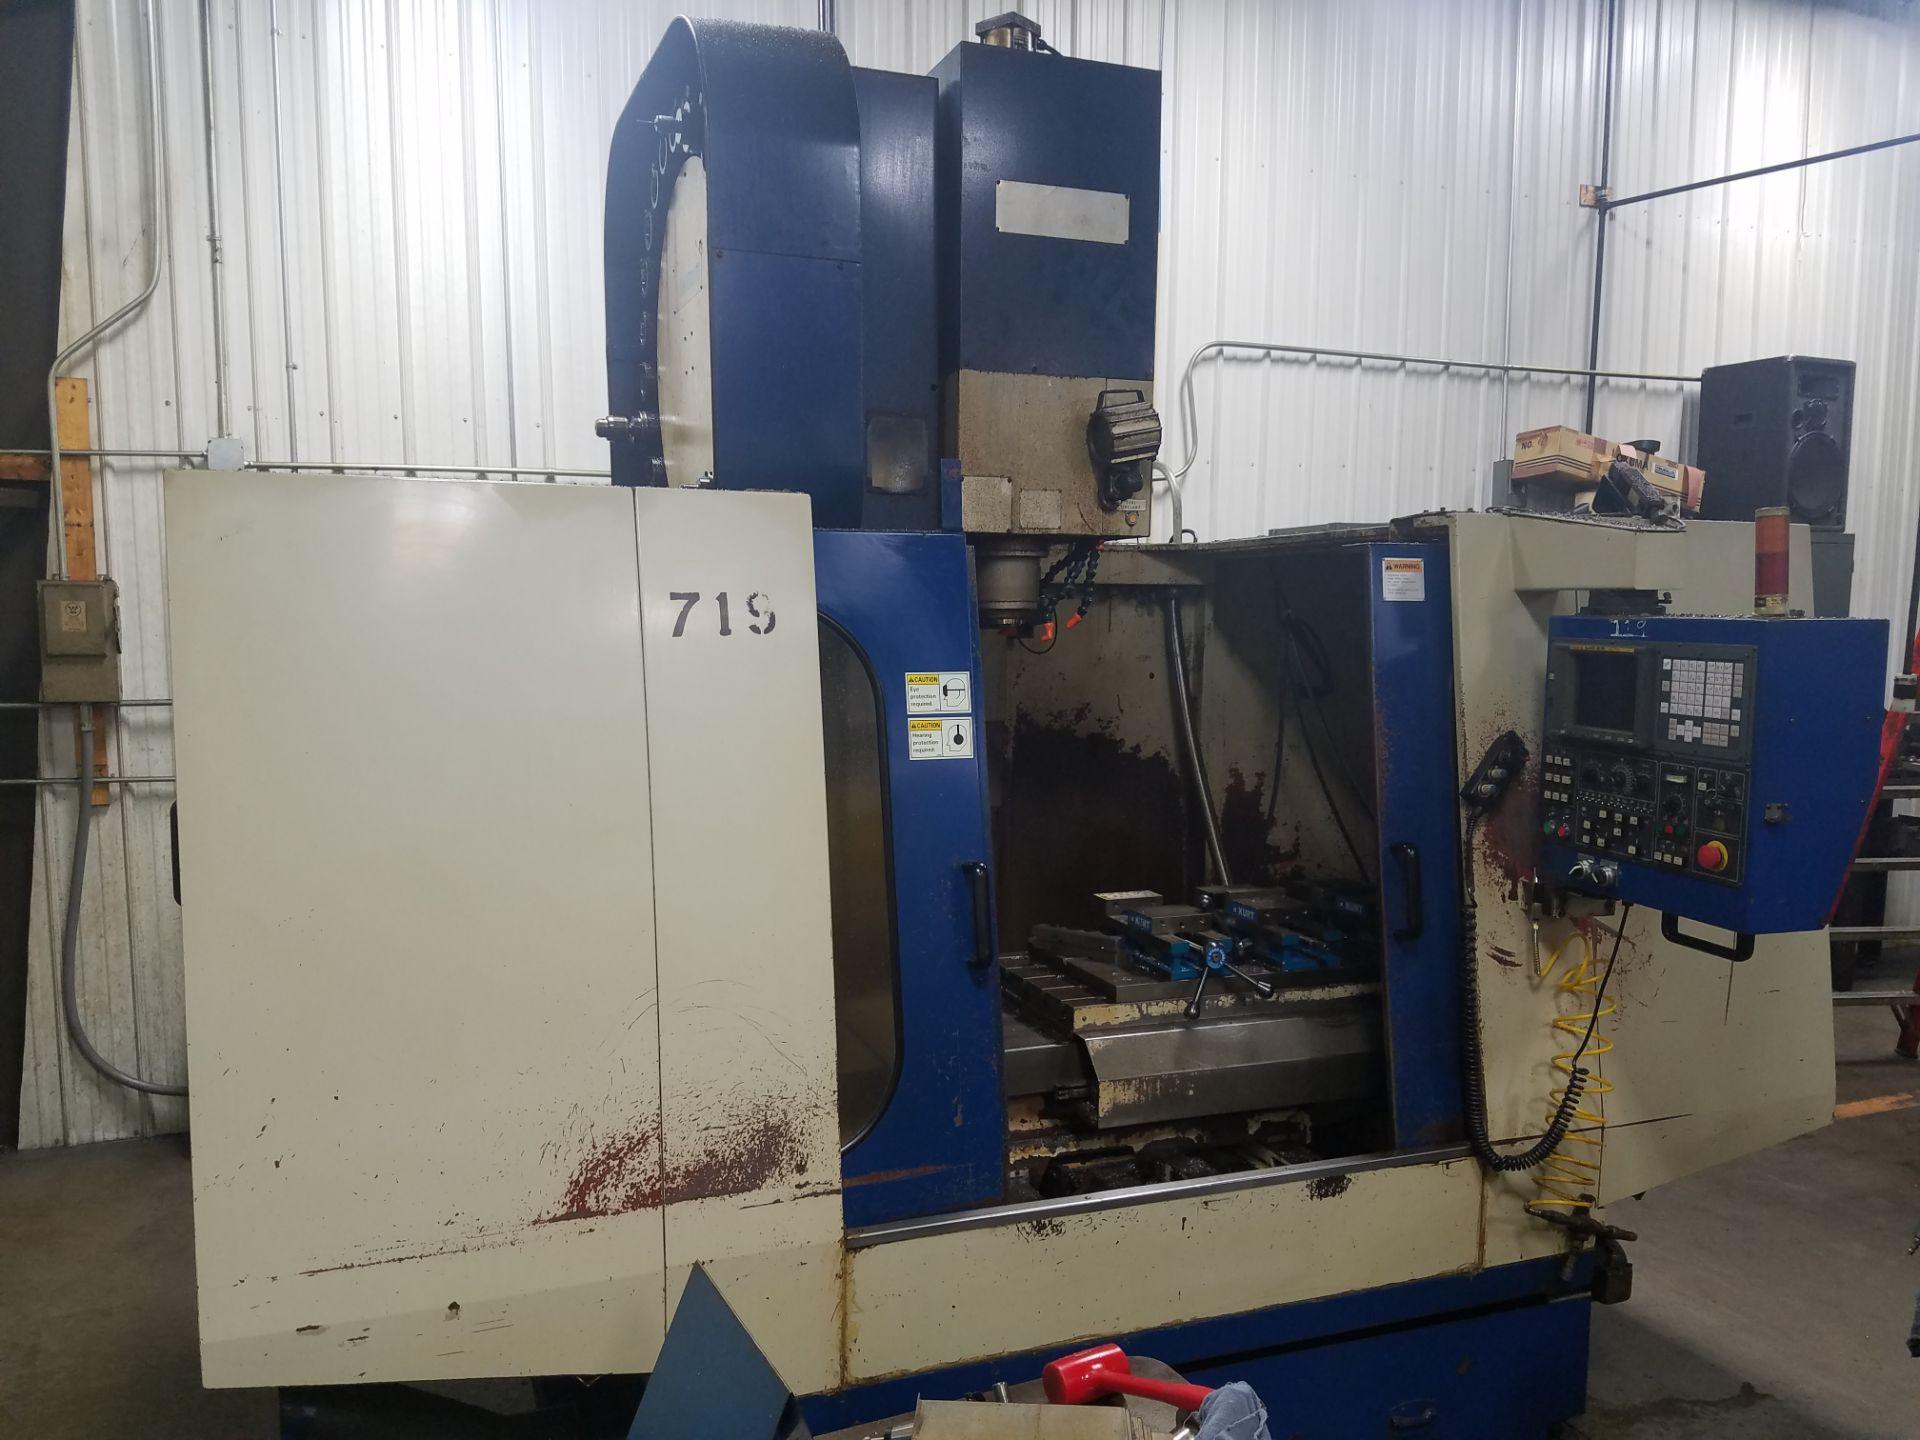 Lotto 27 - Johnford Model SV-45M CNC Vertical Machining Center, s/n VU3107, New 1998, Fanuc 18M CNC Control, 50